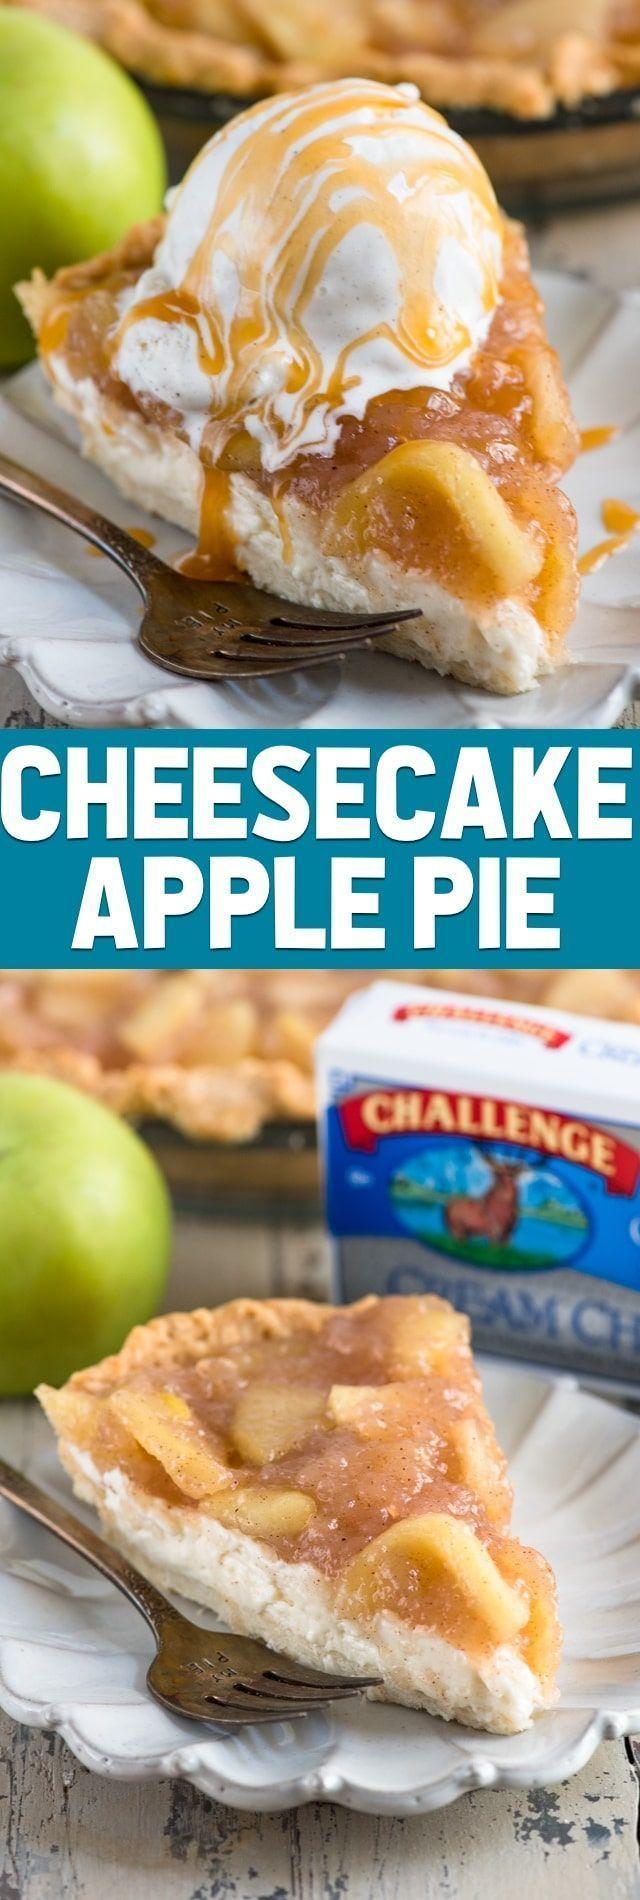 Cheesecake Apple Pie Recipe Homemade apple pie filling